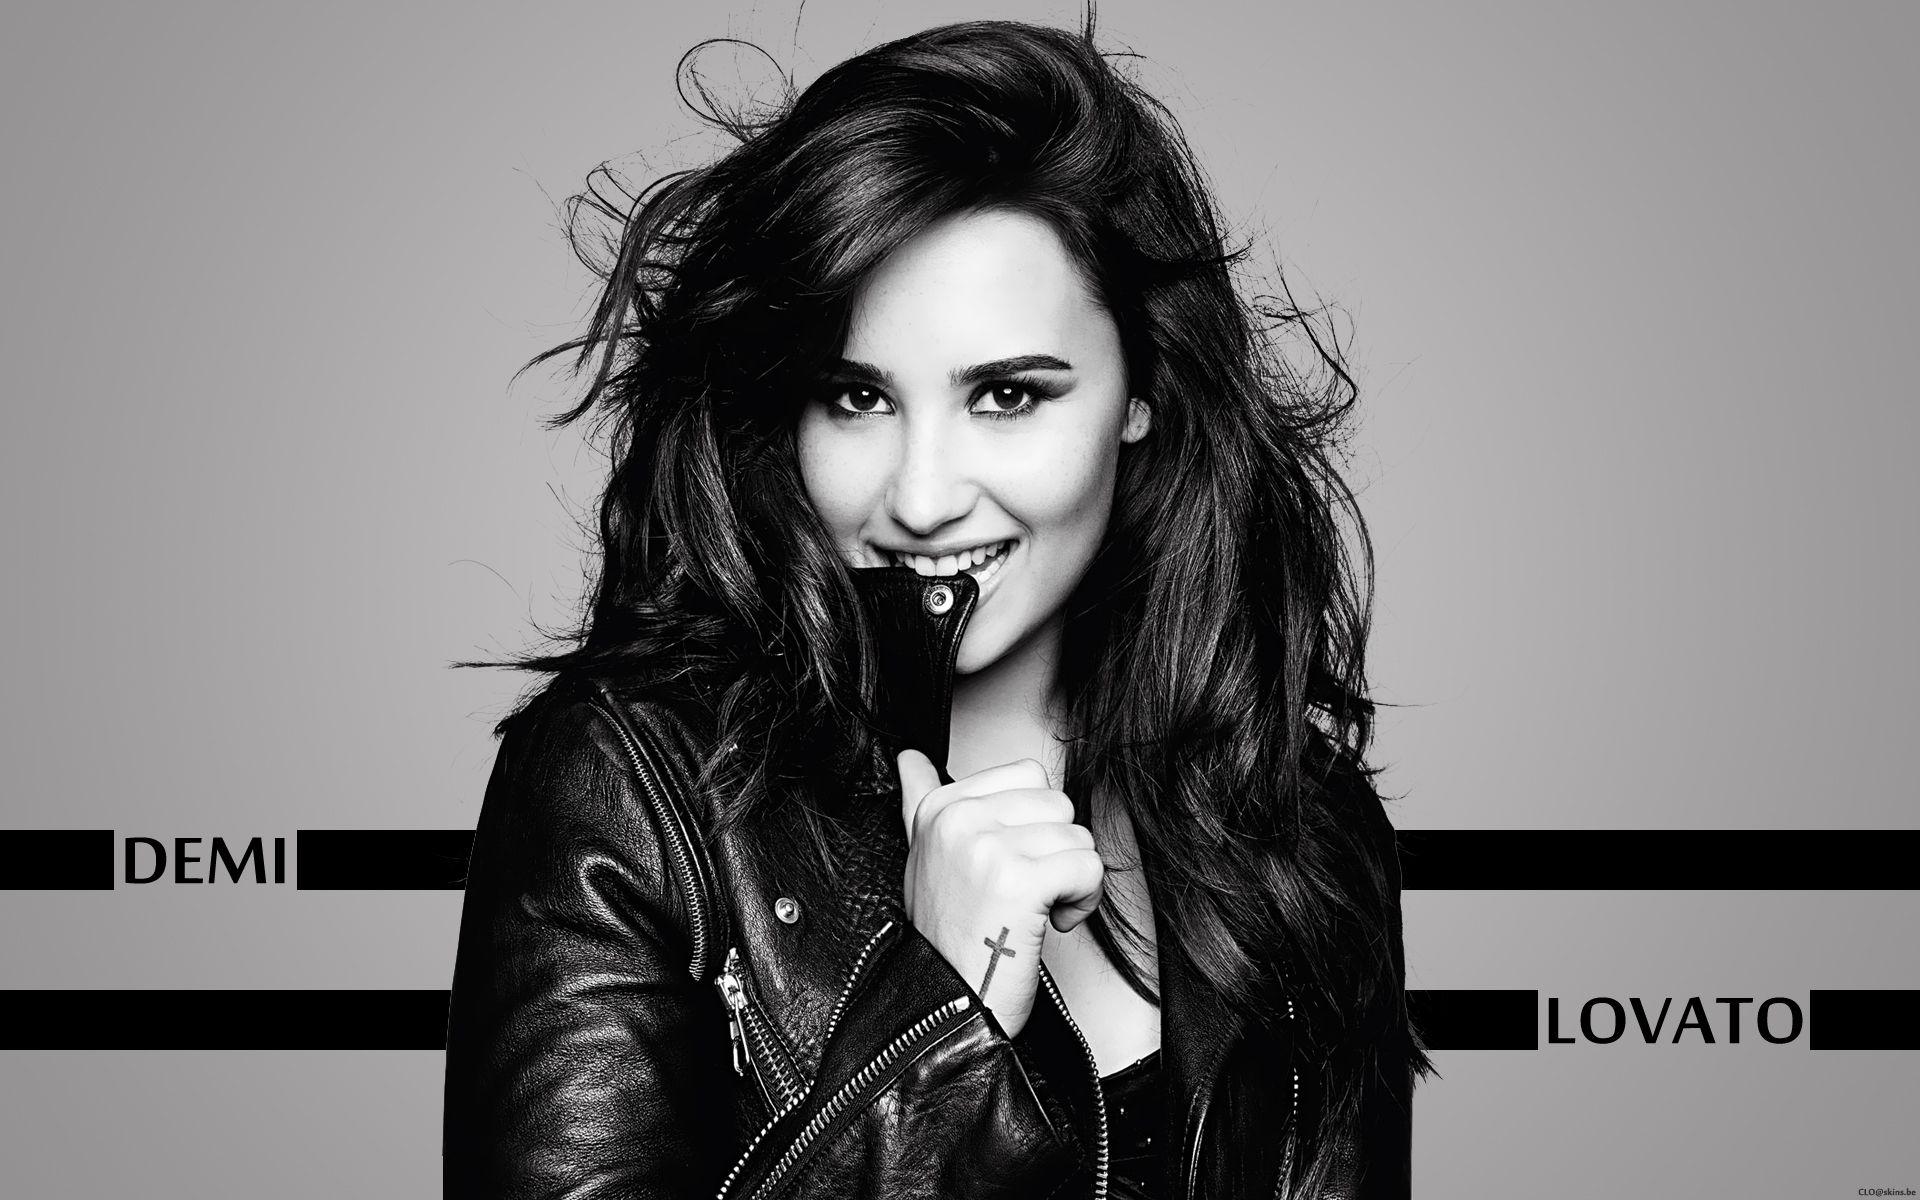 Demi Lovato Wallpaper Desktop Background 9mx People Desktop Hd Wallpapers Demi Lovato Demi Lovato 2014 Lovato